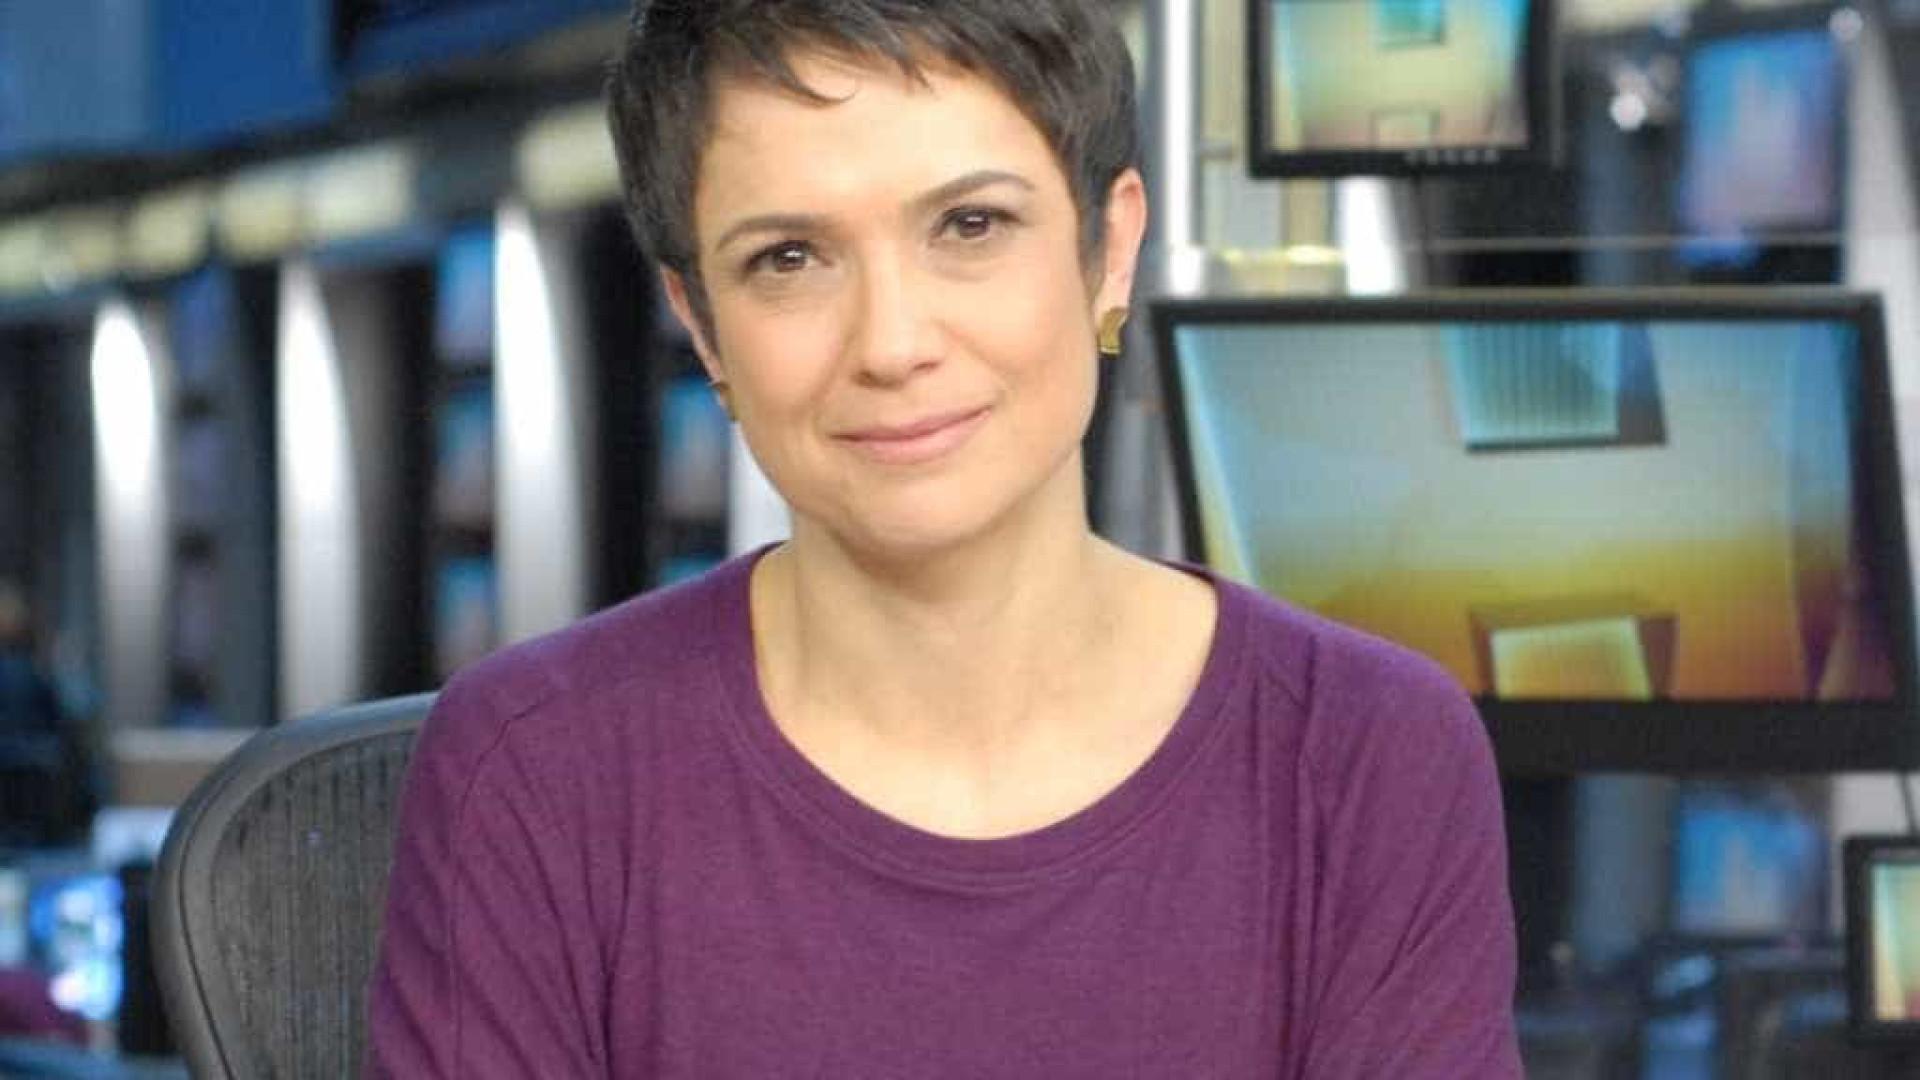 Sandra Annenberg chama Temer de 'ex-presidente' e pede desculpas